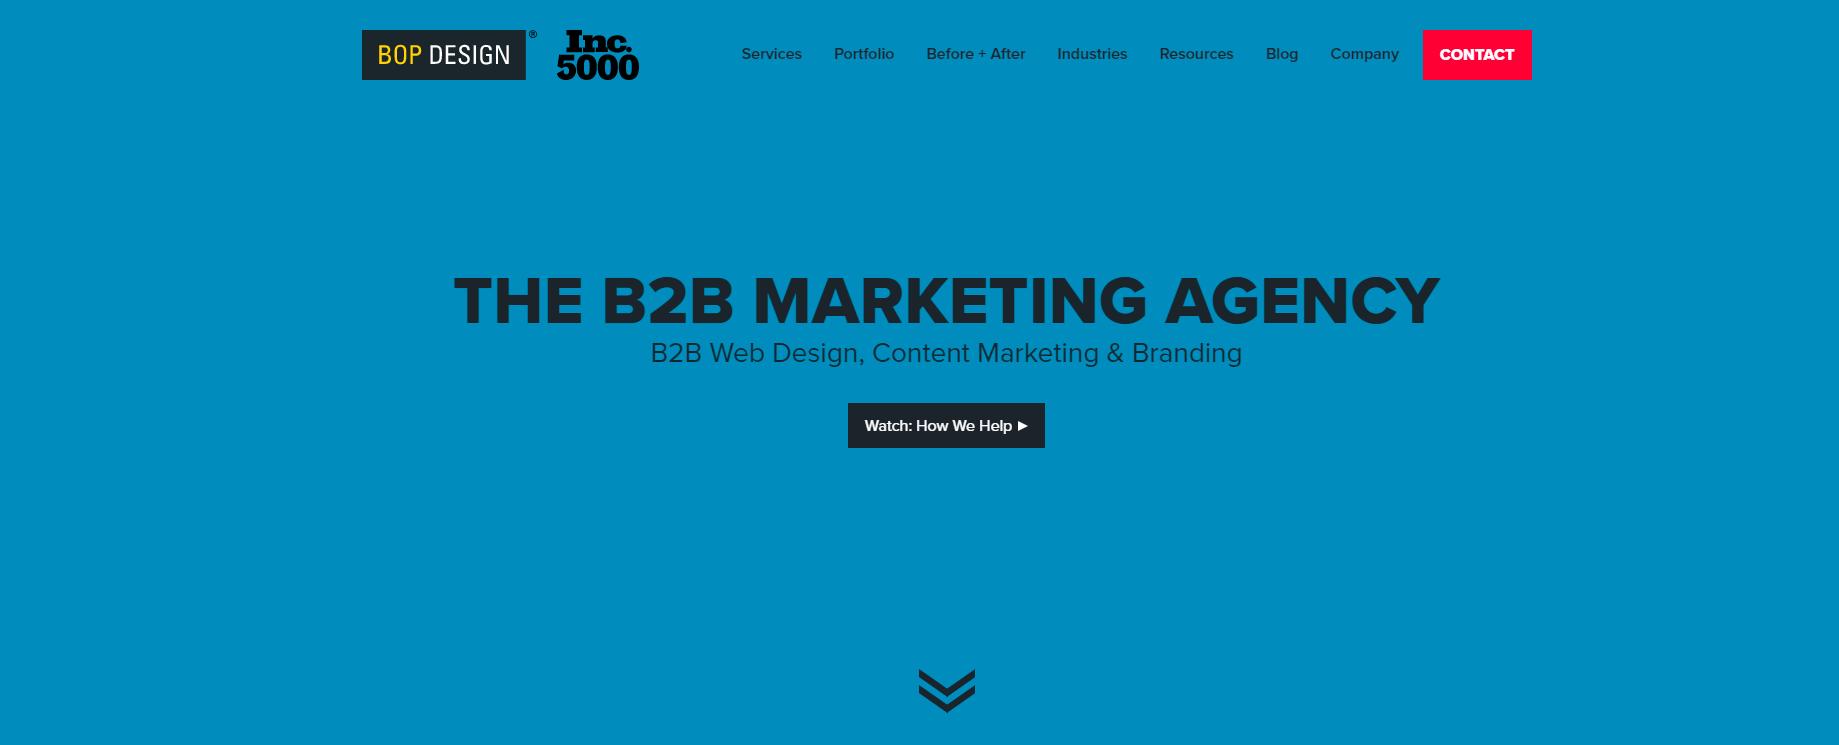 bop designs - web design and development services